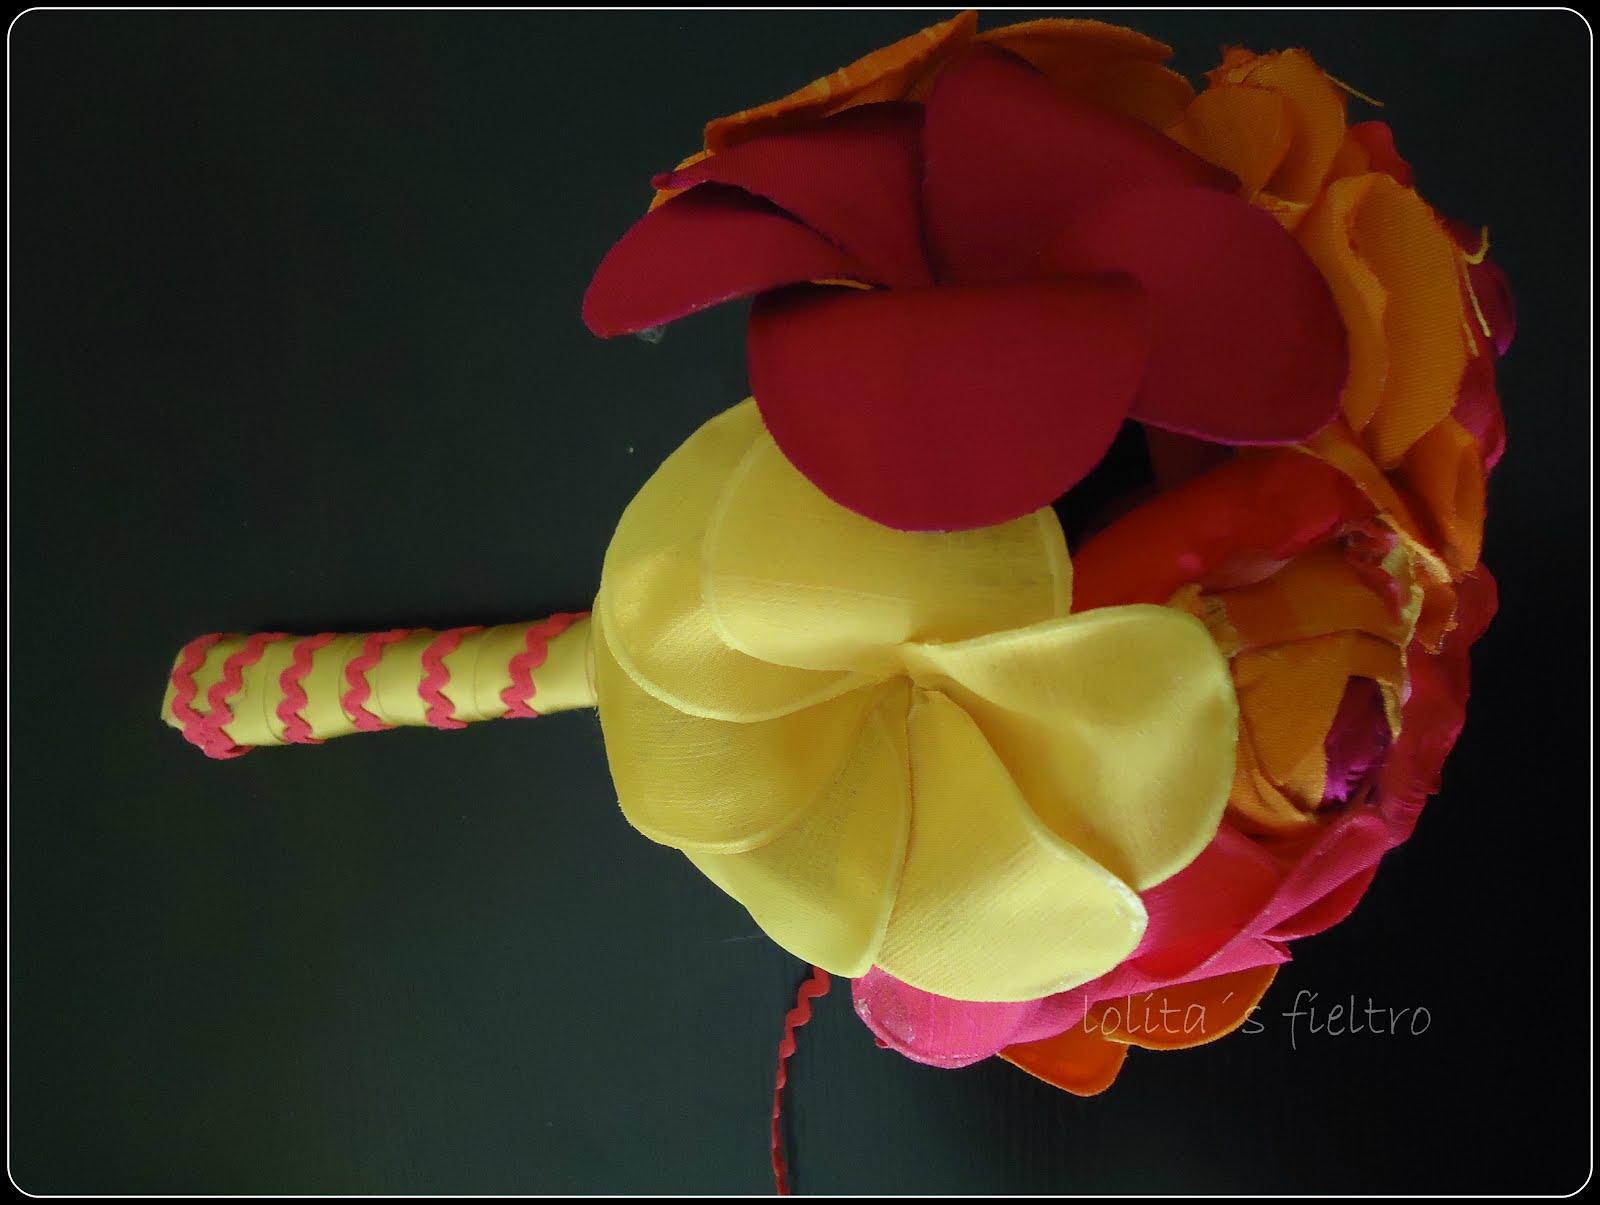 http://1.bp.blogspot.com/-eV_wSVMae-E/T87oQtC6XjI/AAAAAAAACw4/9JBdvO_Bf-4/s1600/bouquet%2Bseda%2B6.jpg